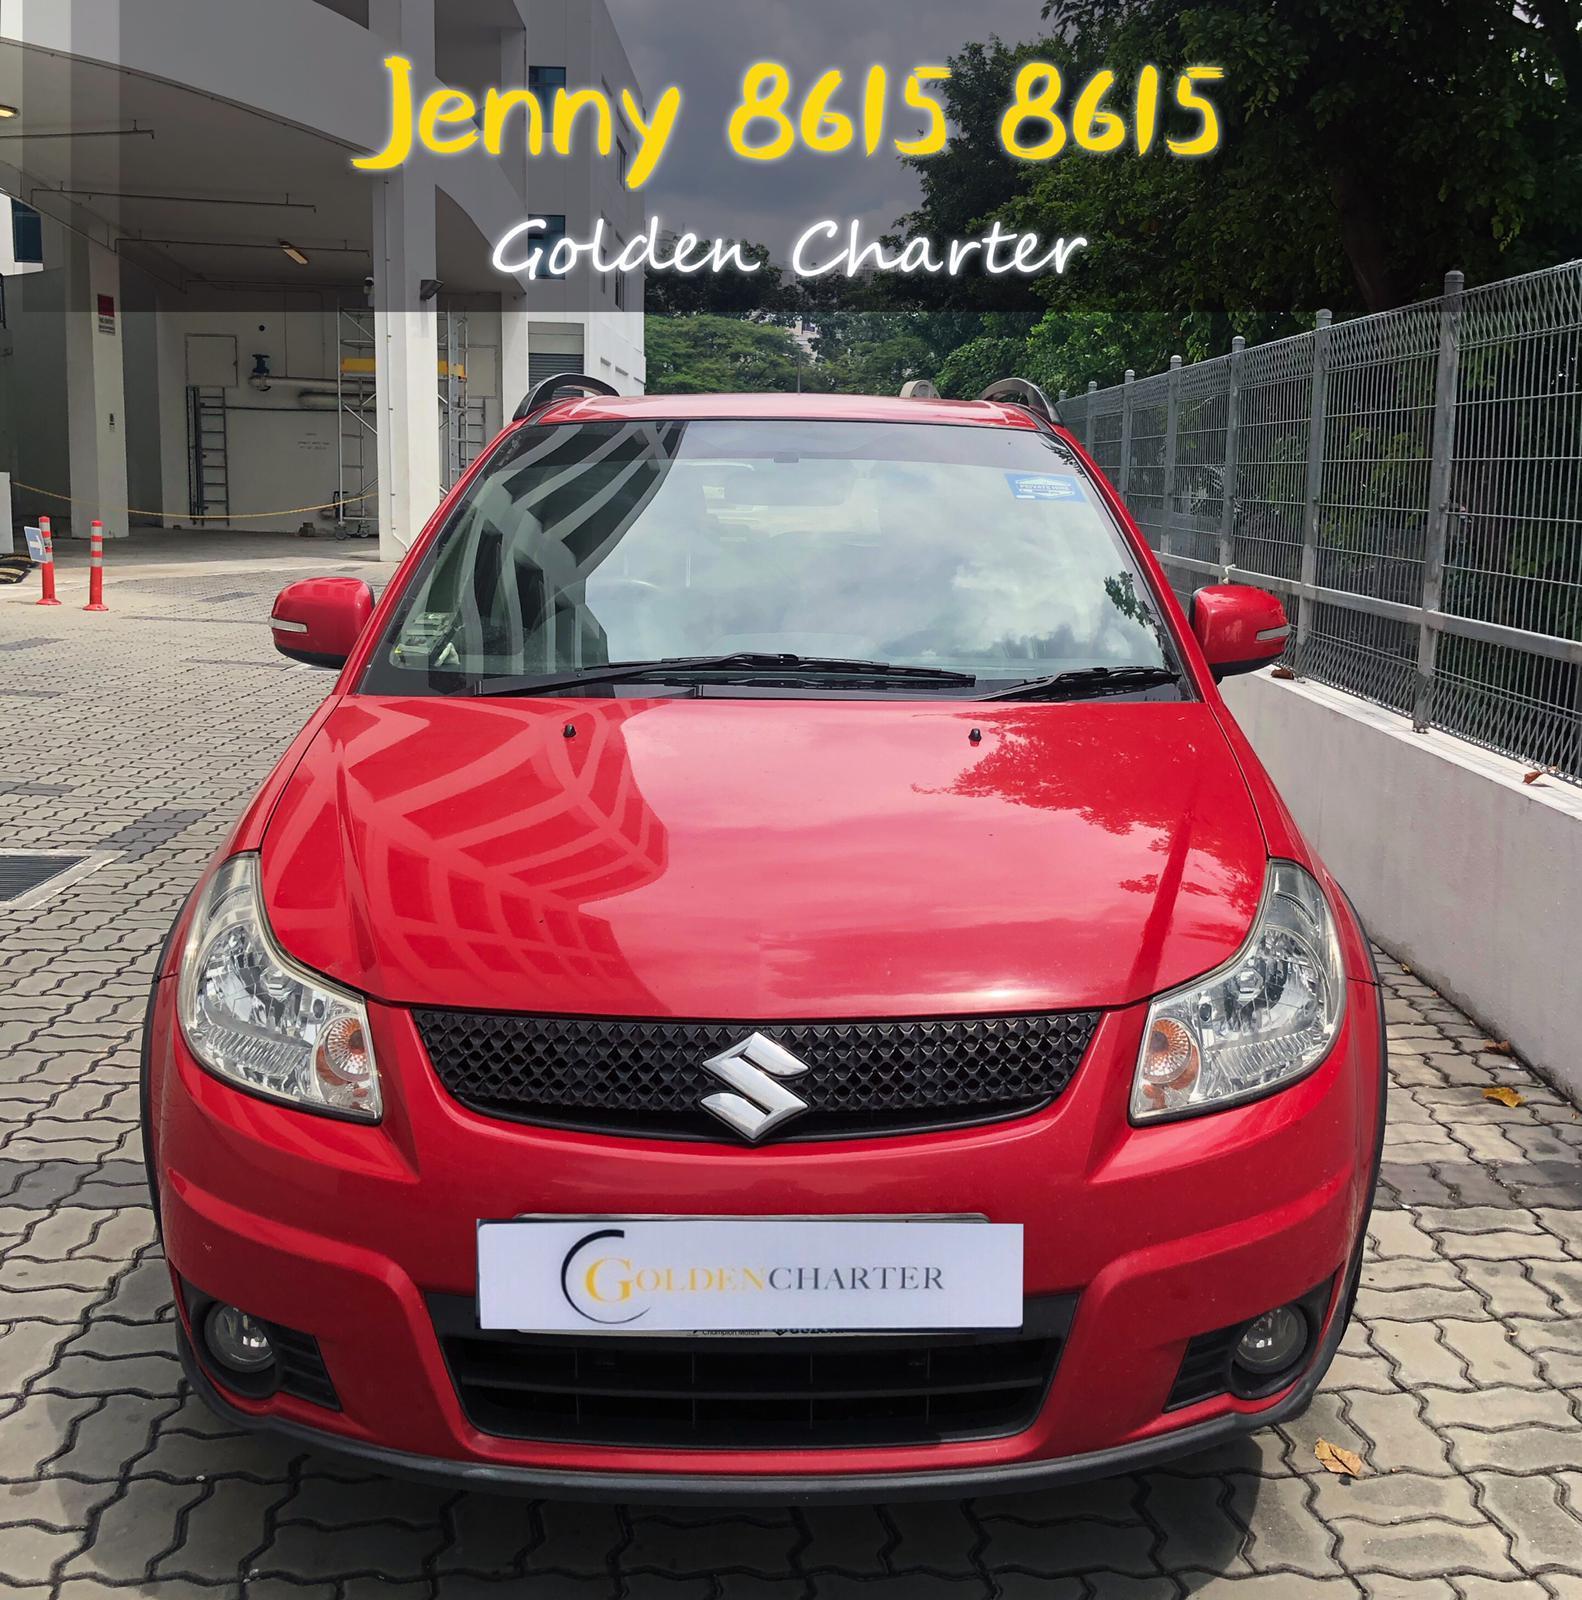 Suzuki SX4 1.6a Vios Altis Car Jazz Fit Cars Hyundai Avante Mazda 3 mpv gojek,grab n personal use cheaper car rental